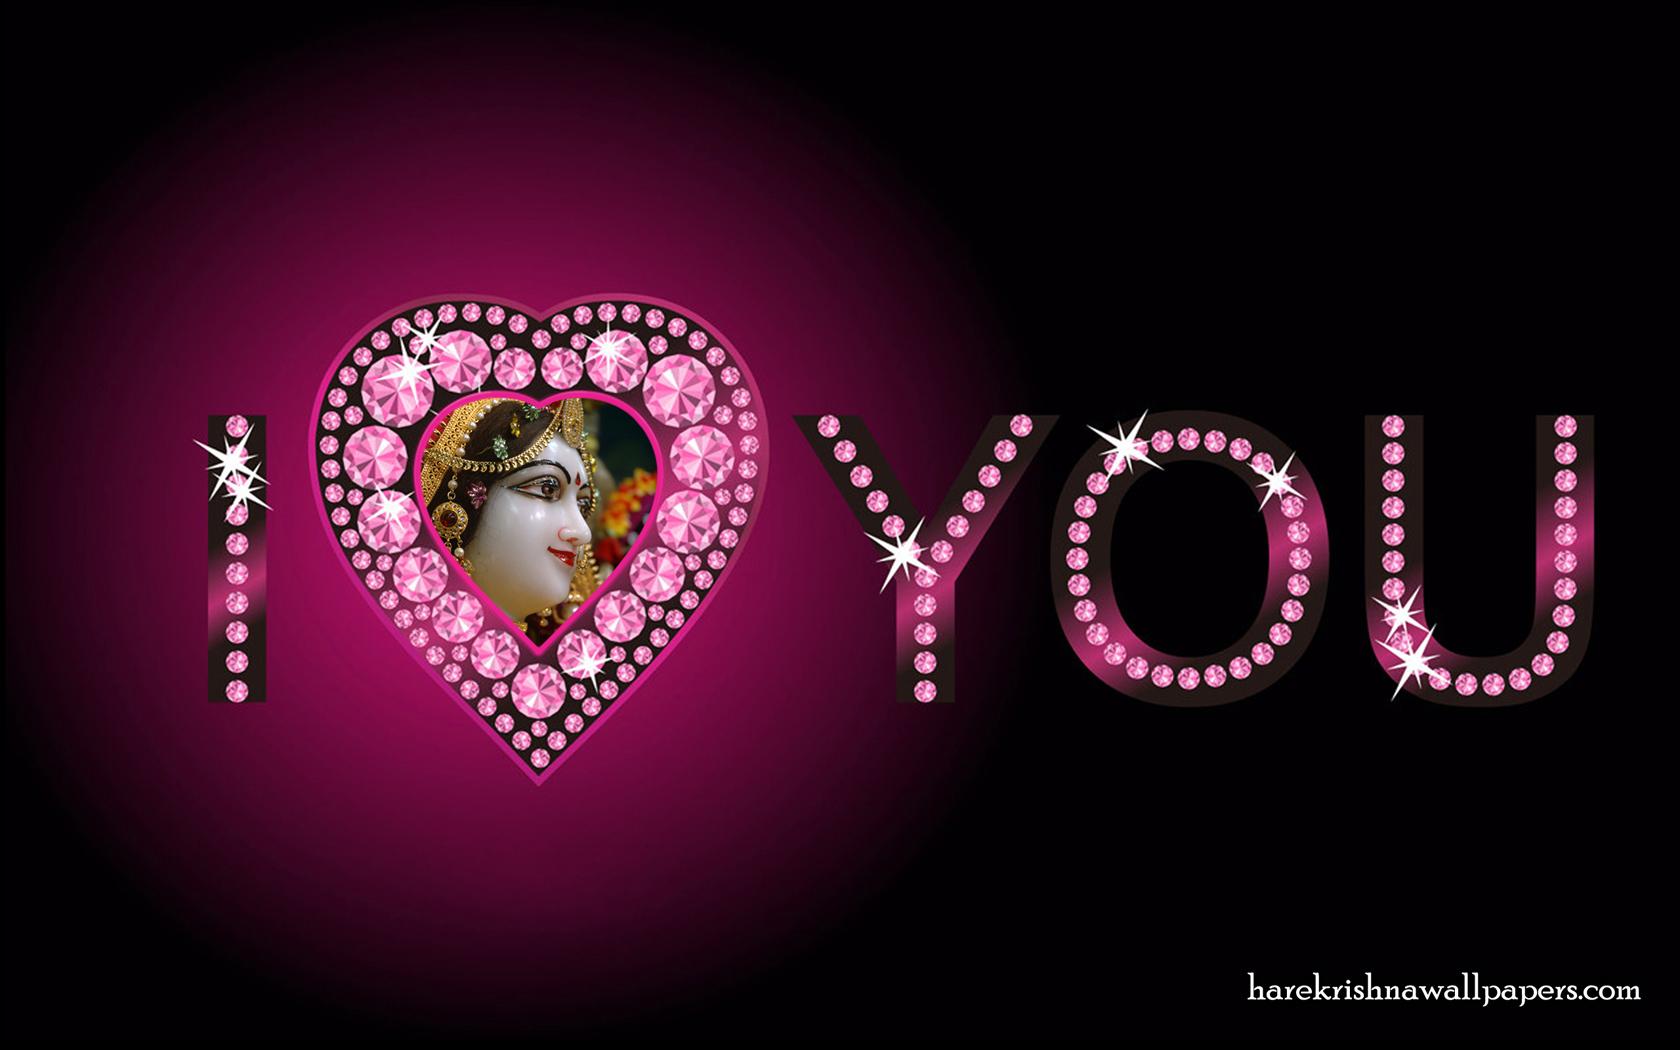 I Love You Radharani Wallpaper (011) Size 1680x1050 Download